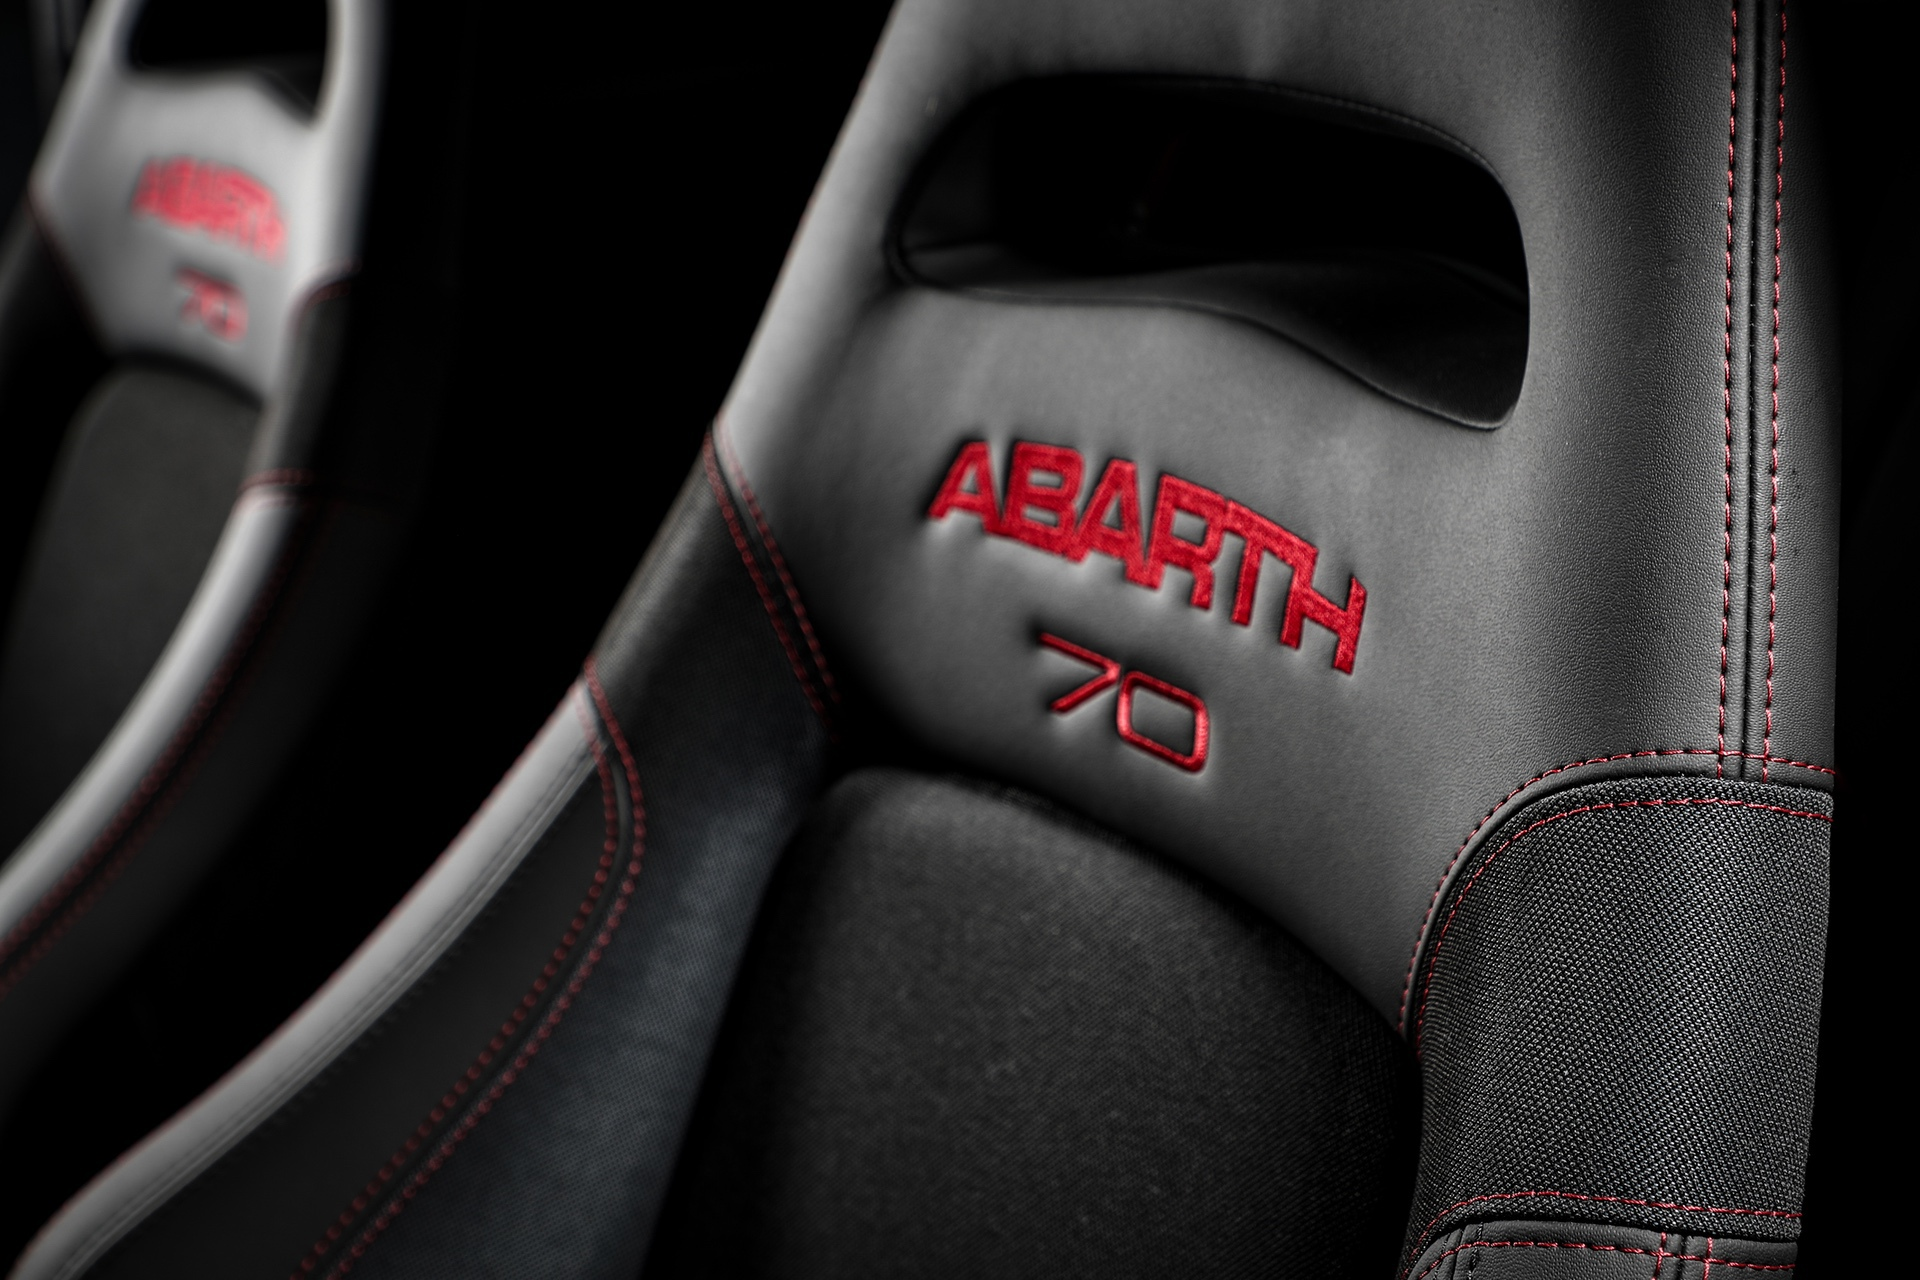 Abarth_595_esseesse_27